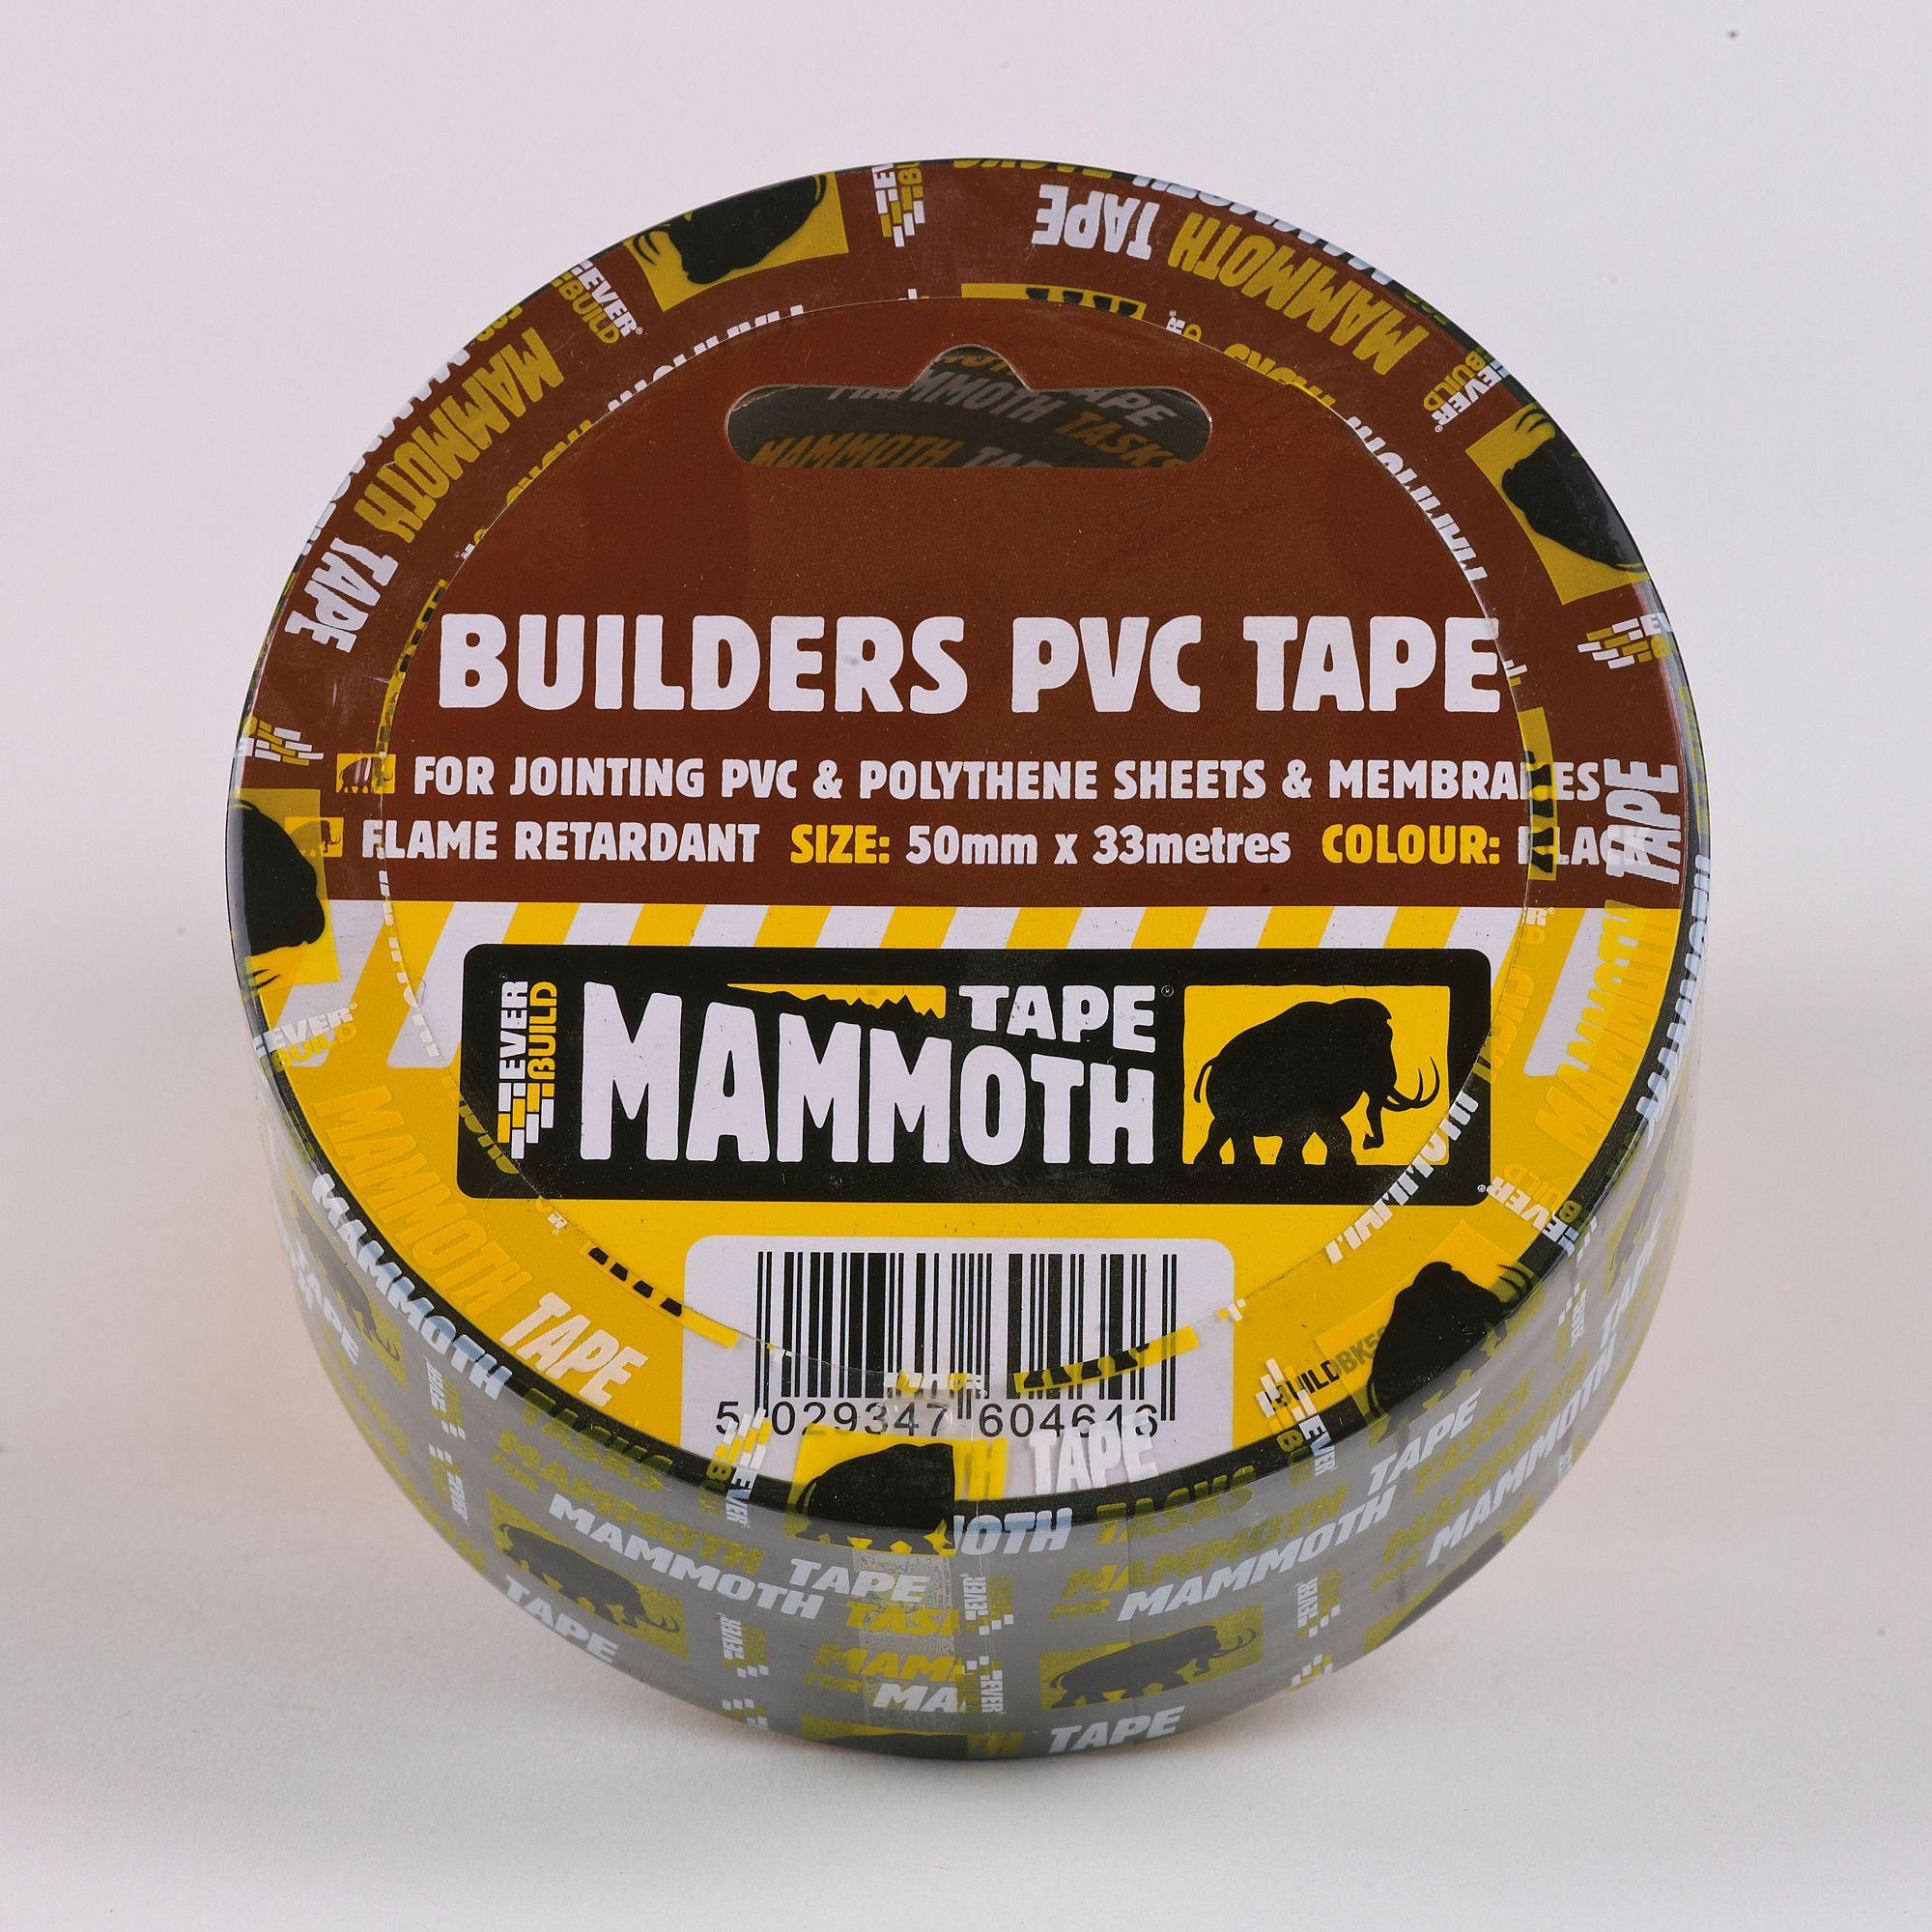 BUILDER'S PVC TAPE 75MM X 33M BLACK